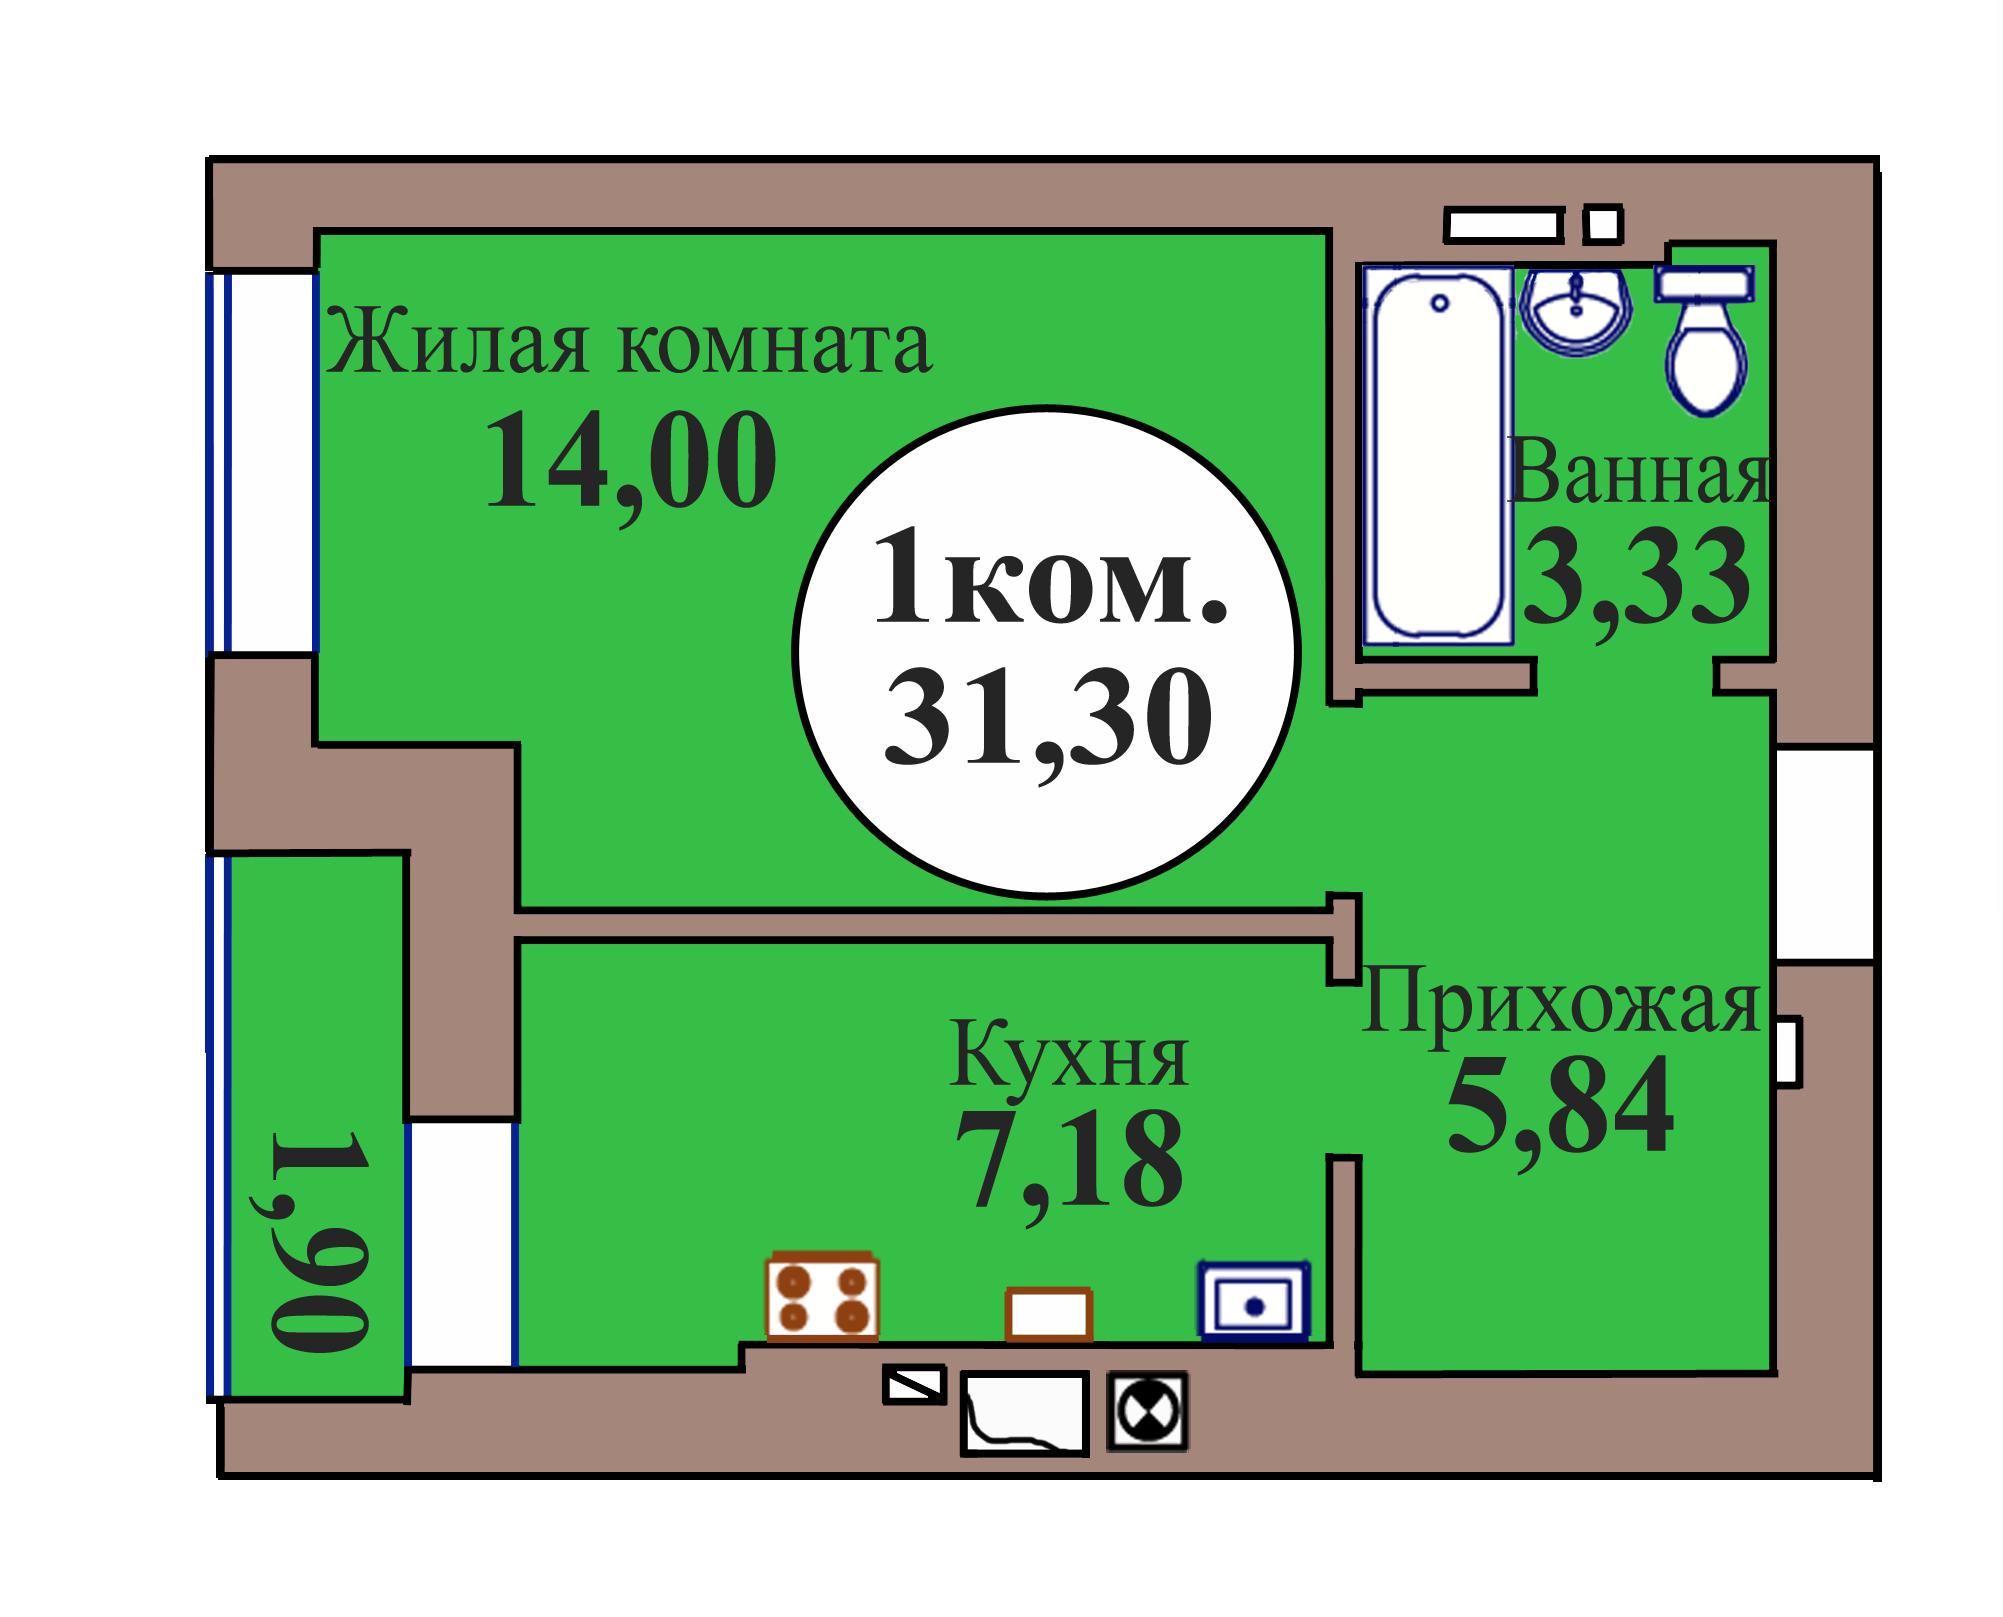 1-комн. кв. по ГП дом №3, МКР Васильково, кв. 11 в Калининграде